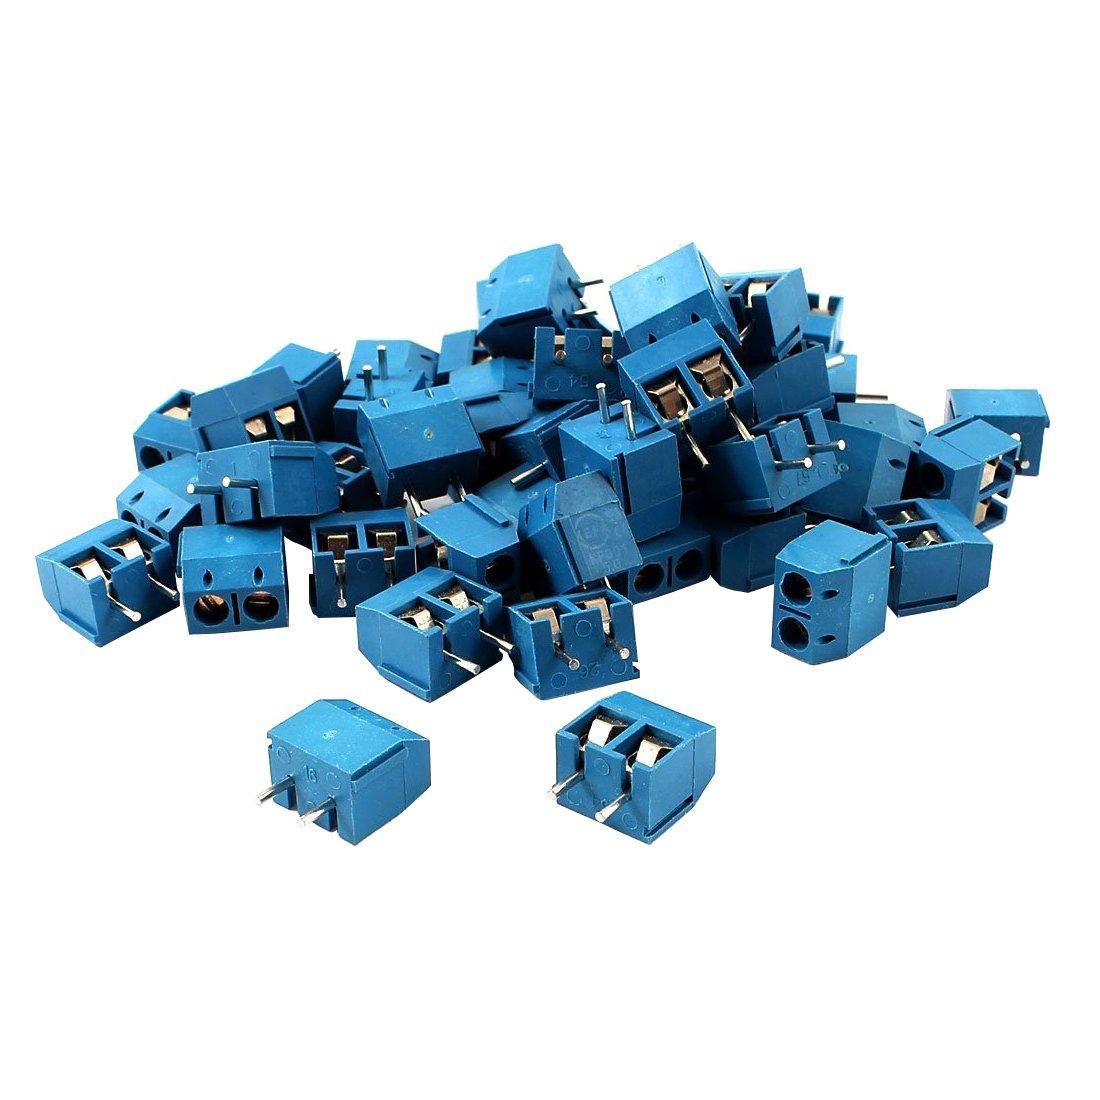 SODIAL 50pcs Borniers a vis de montage bleu de l'Espacement de 5mm de PCB 300 V 16A